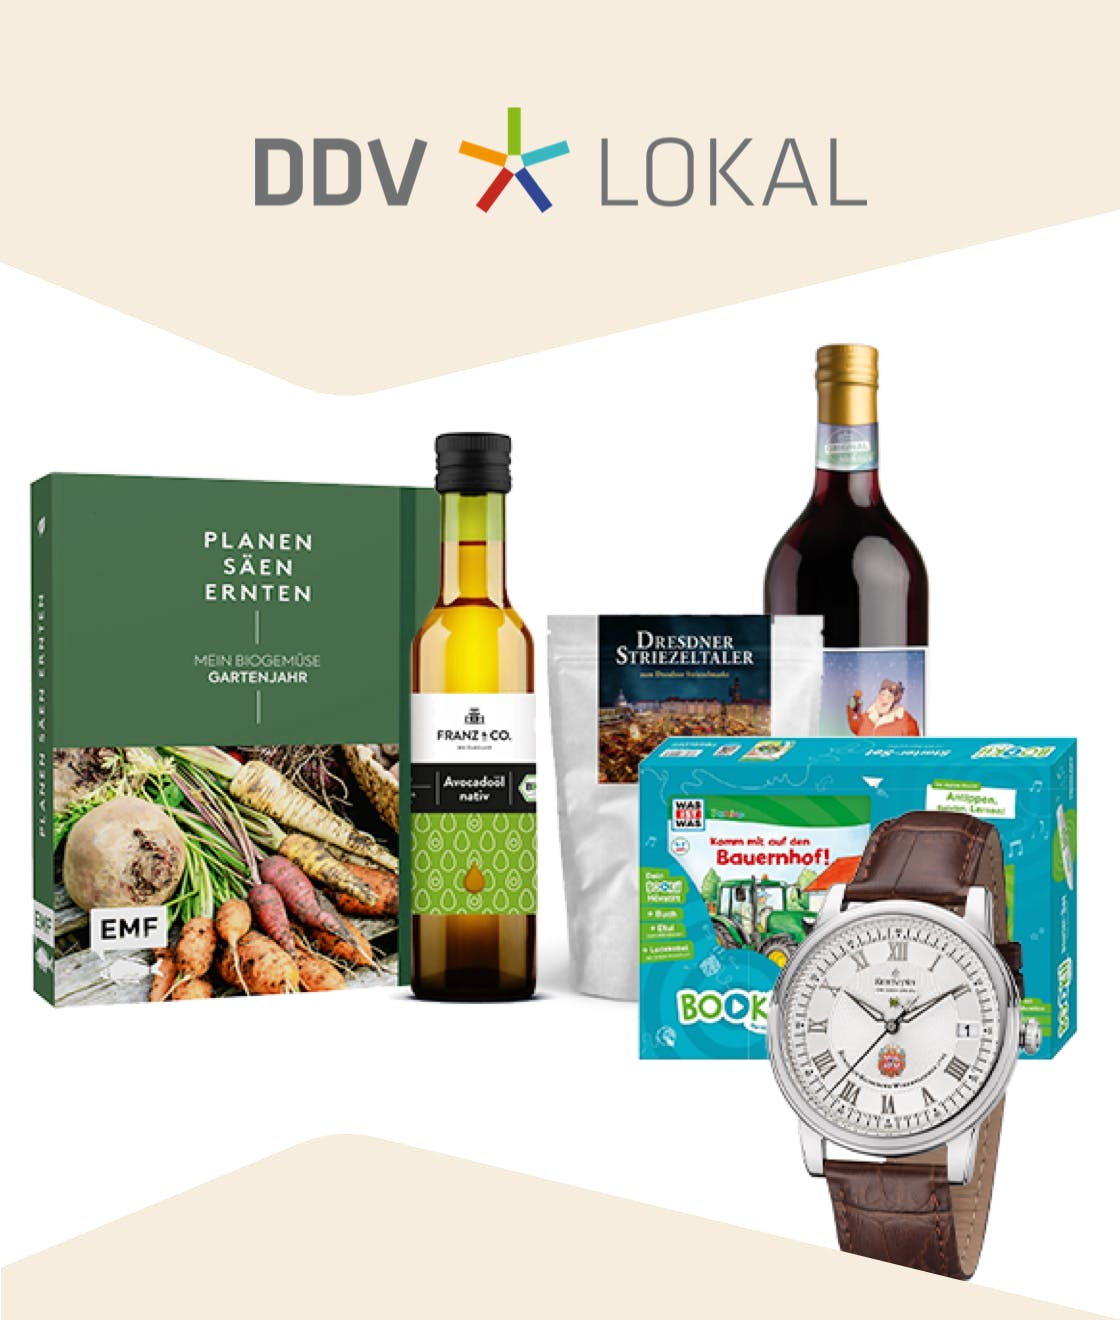 DDV Lokal